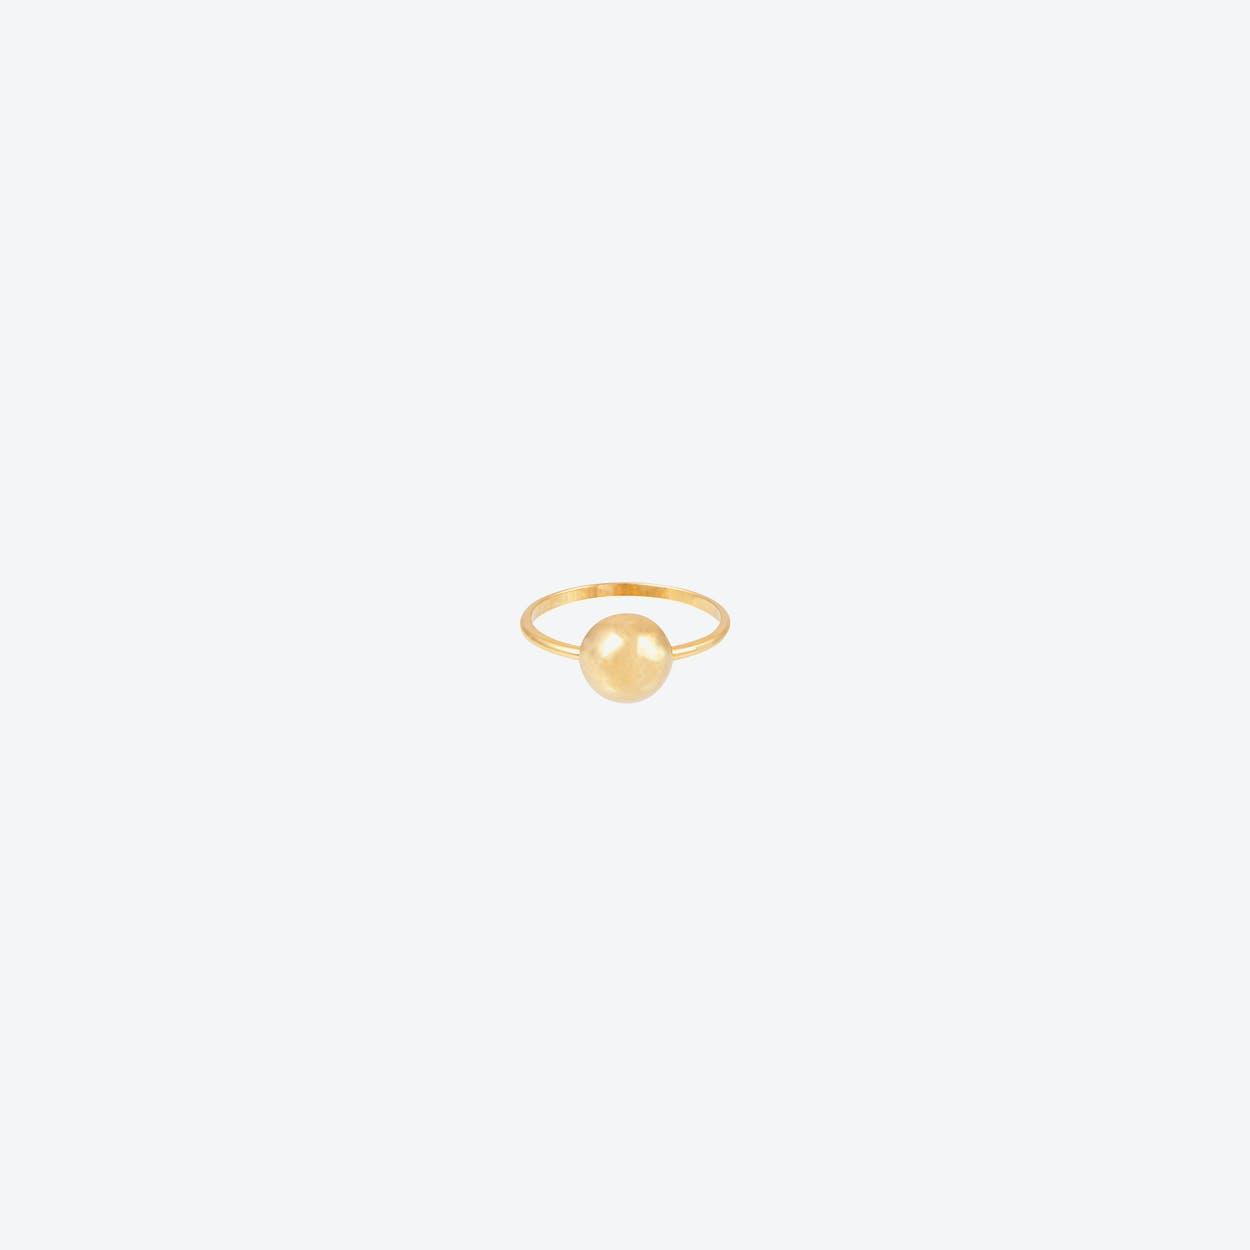 Half Ball Gold Ring